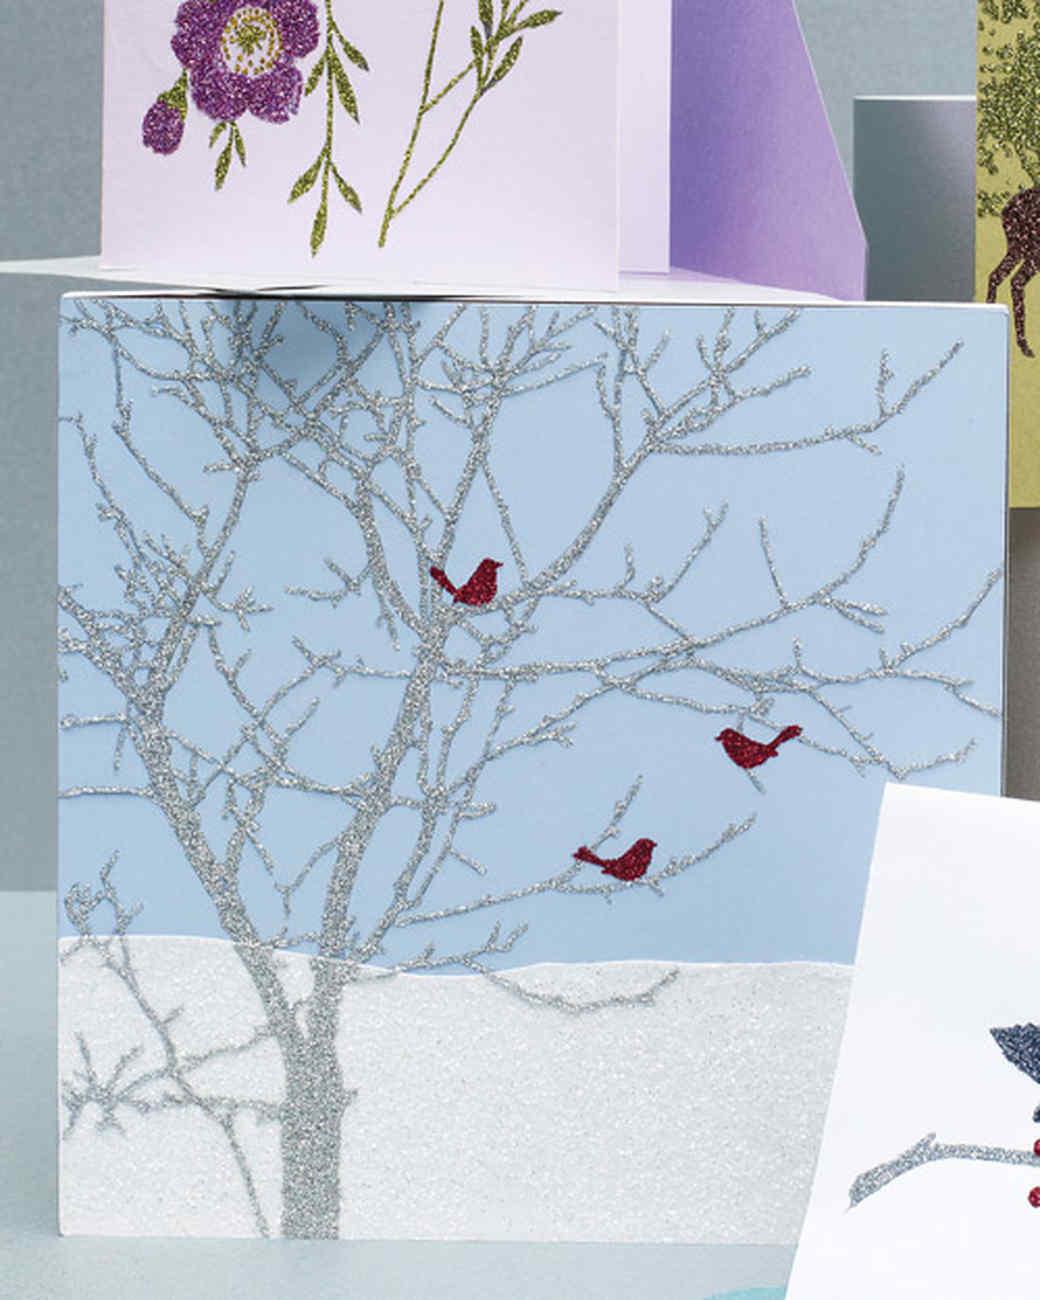 mld105178_1109_newseasons_birdstree.jpg